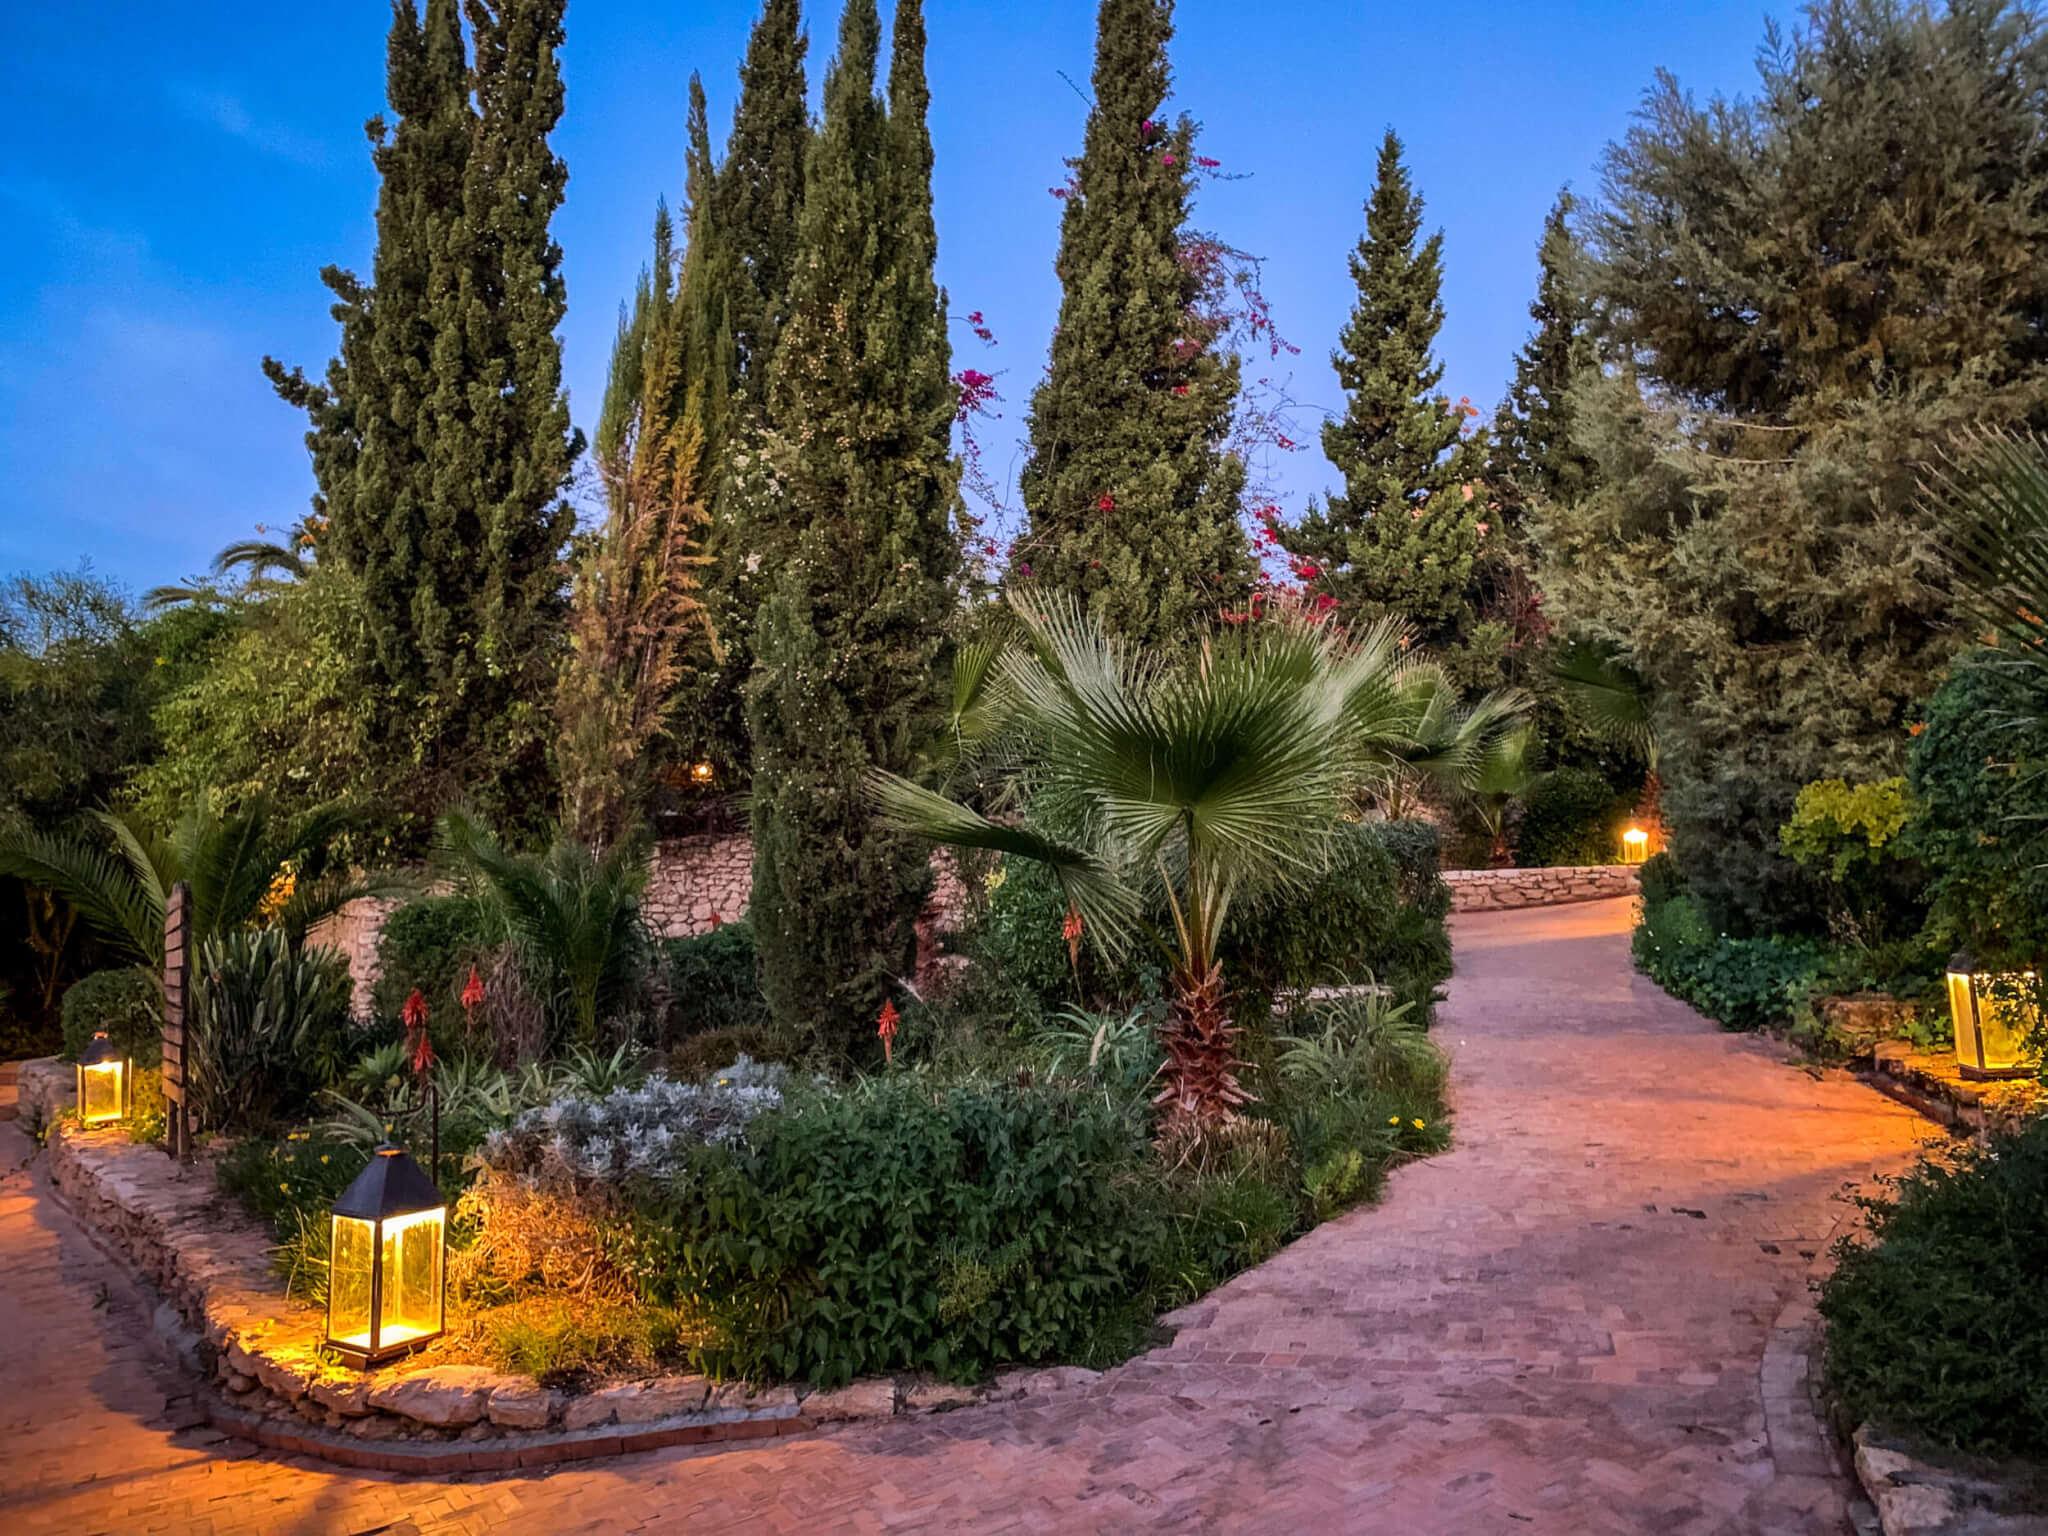 Le jardin des Douars gardens at dusk